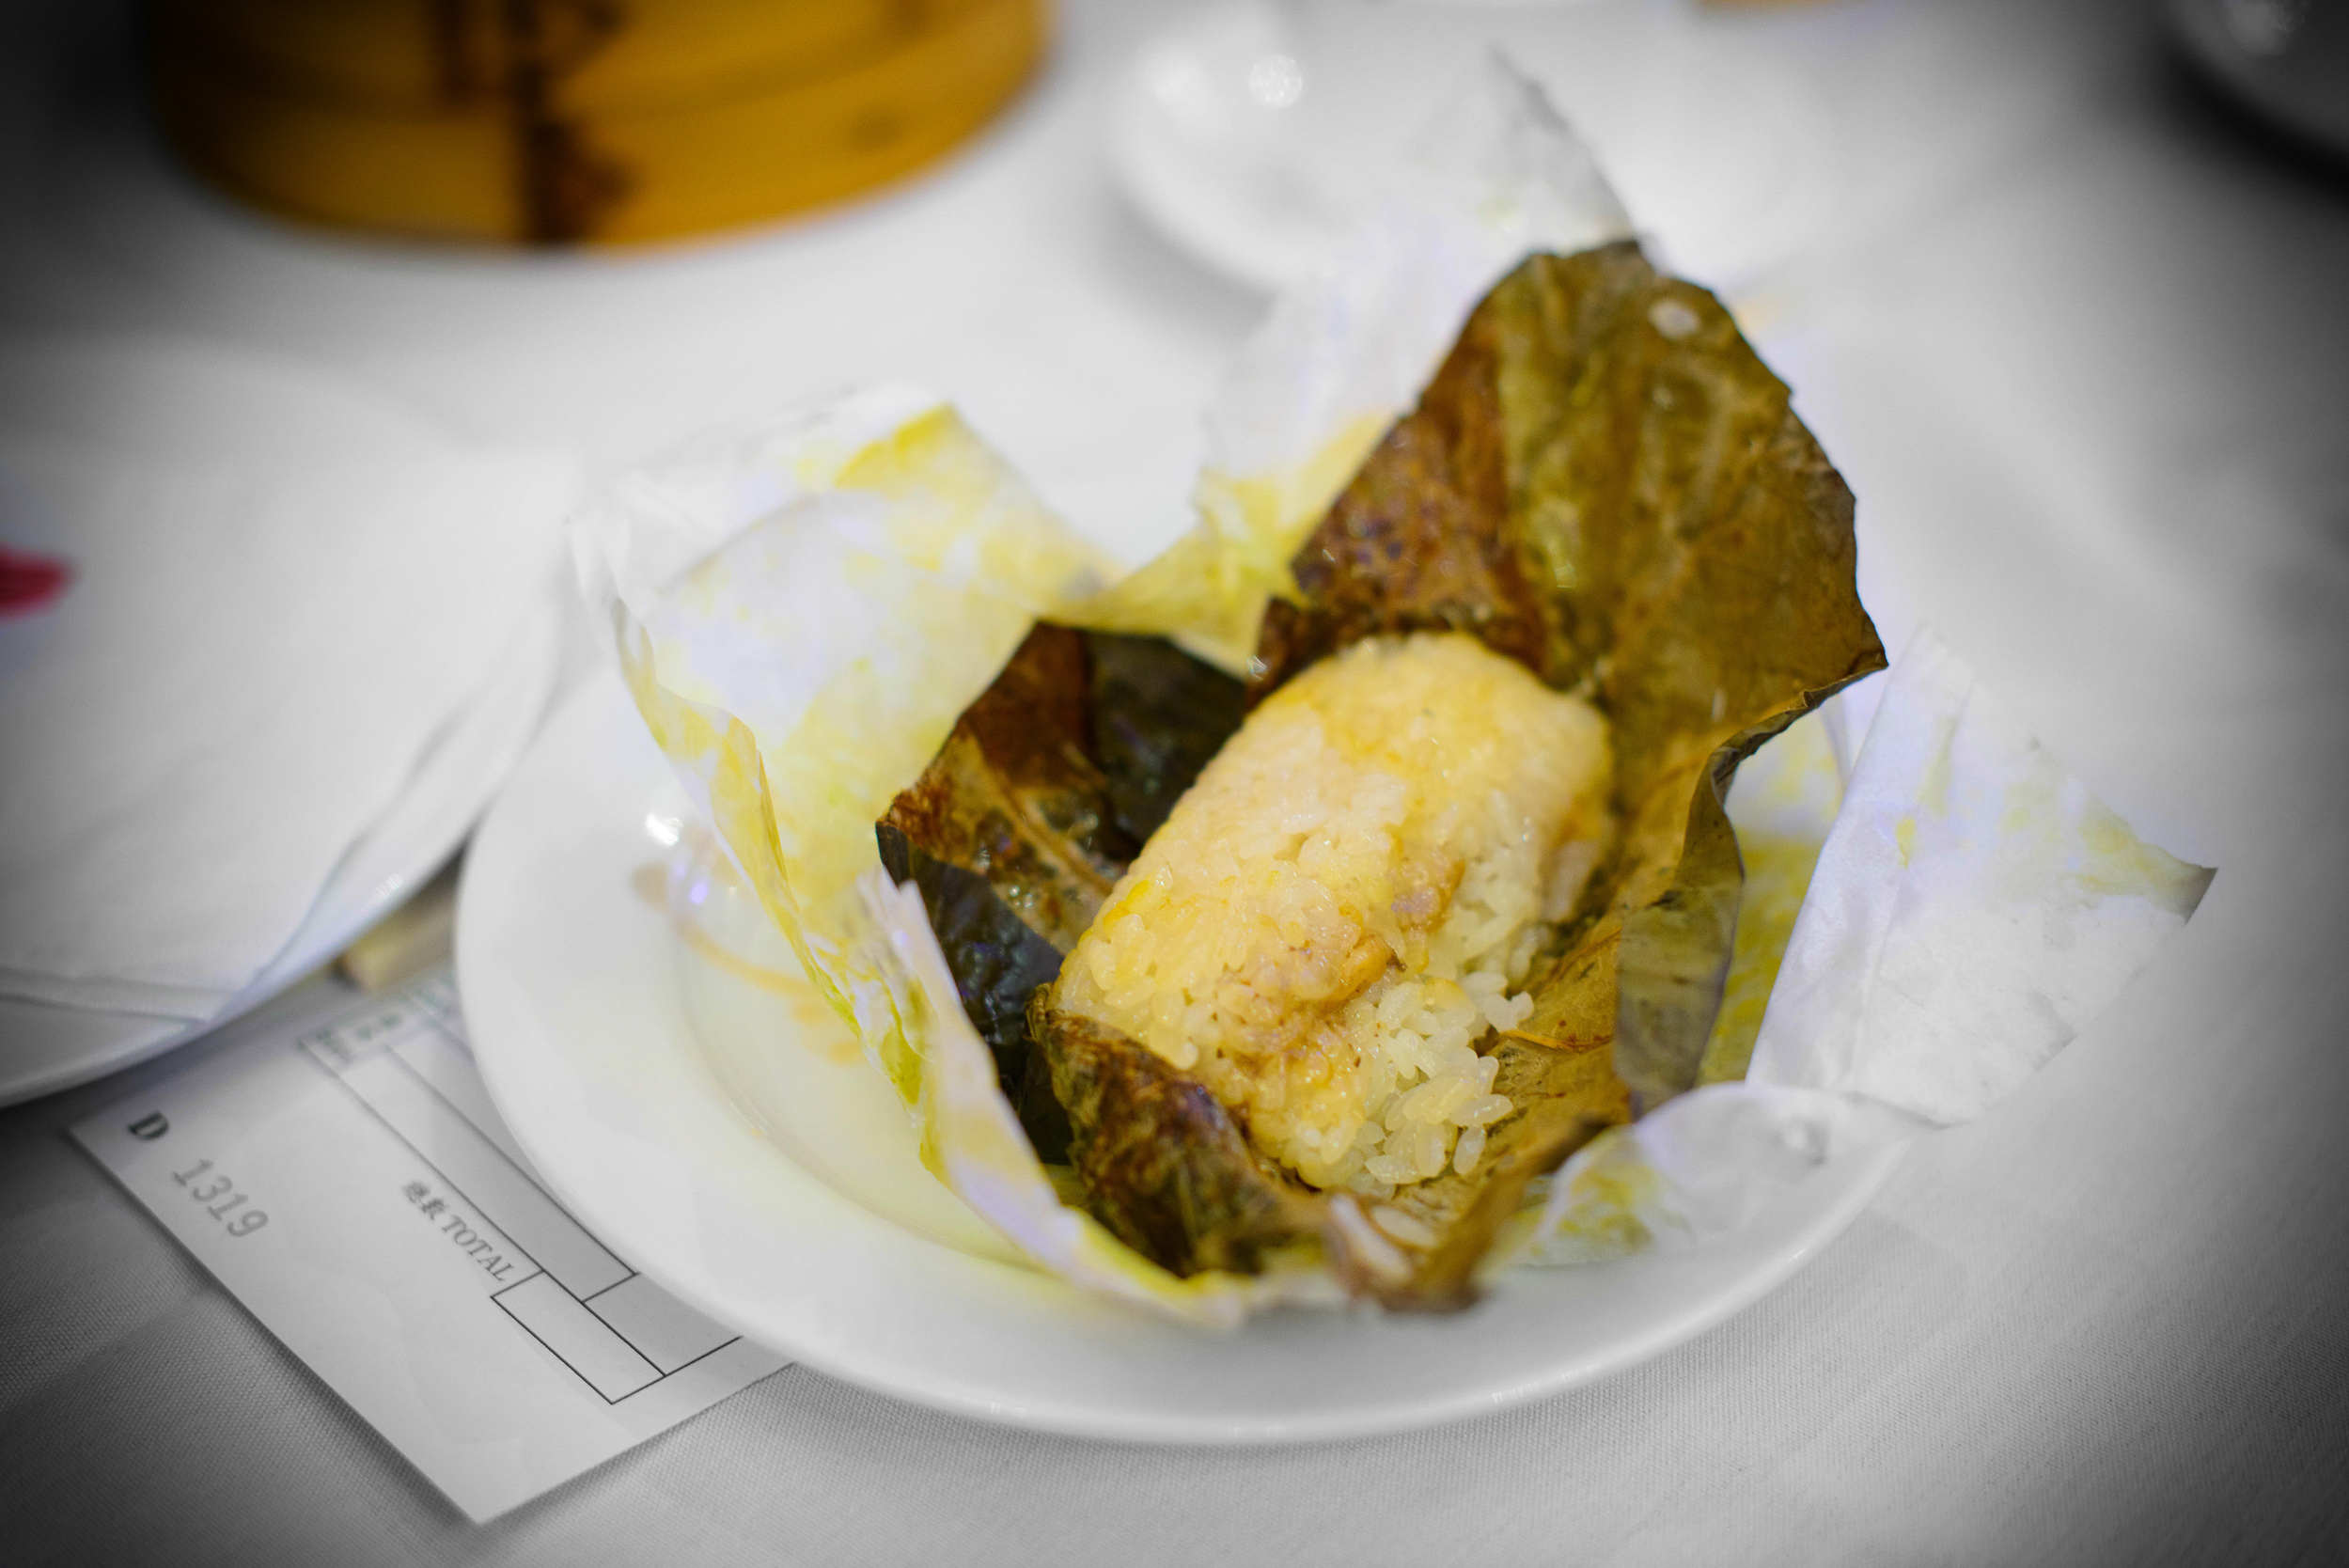 Taro leaf, sticky rice, dried shrimp, inside